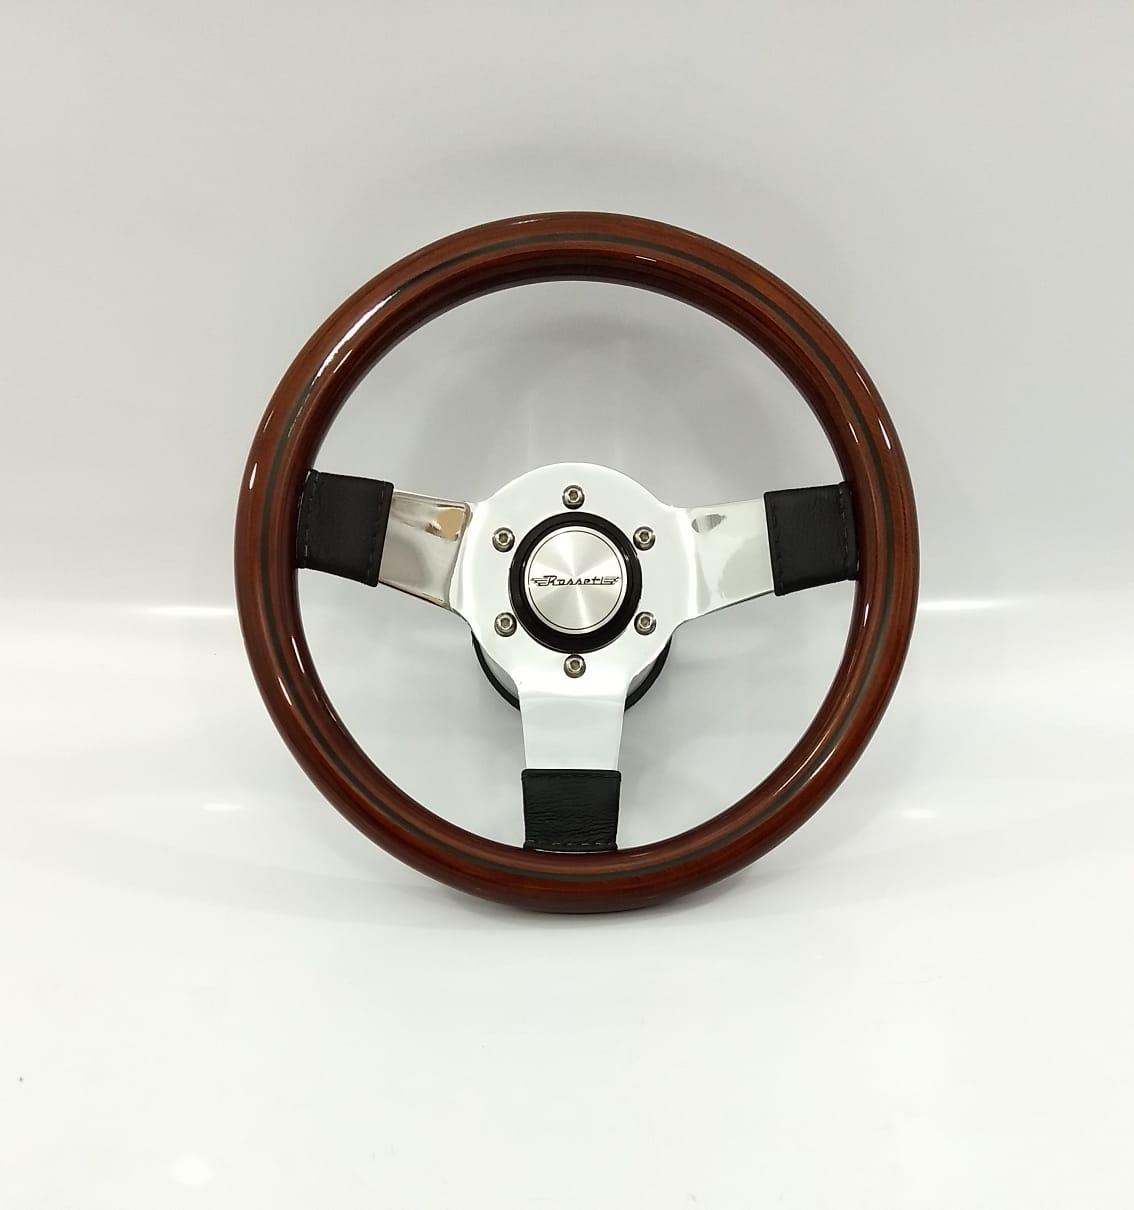 Volante Lenker Super mini Madeira